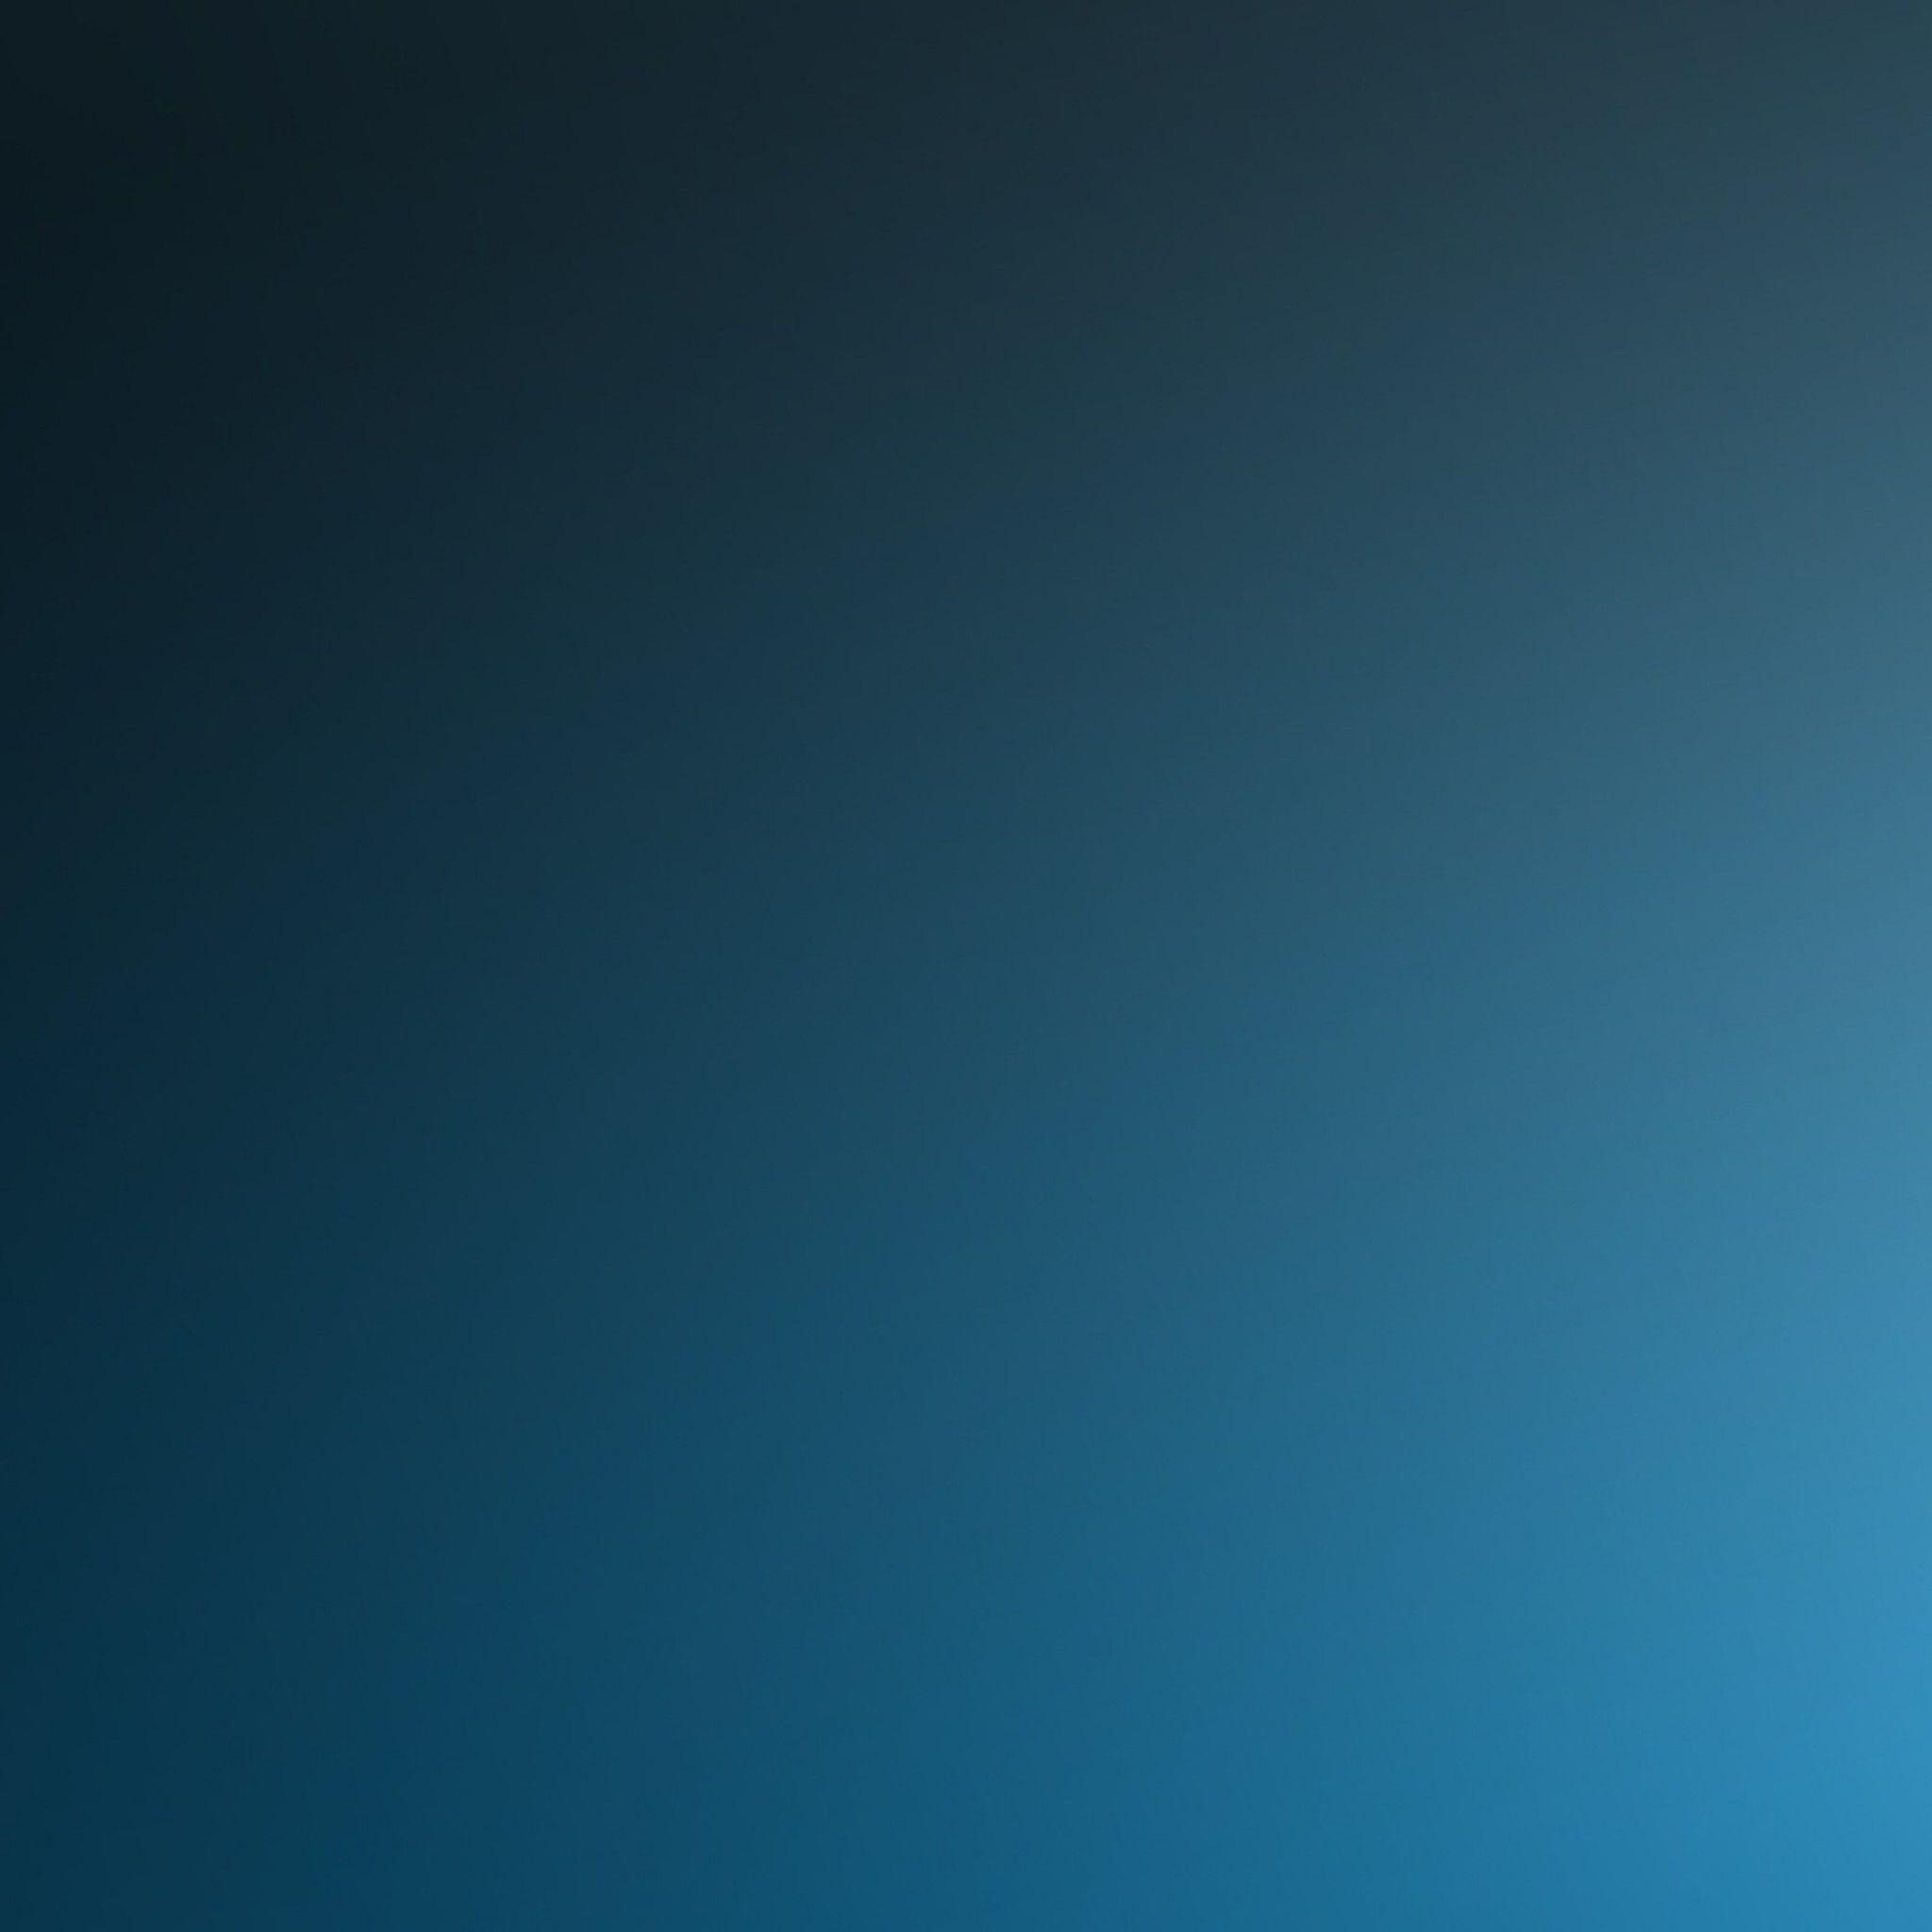 2048x2048 Solid Color Wallpaper for iPhone - WallpaperSafari